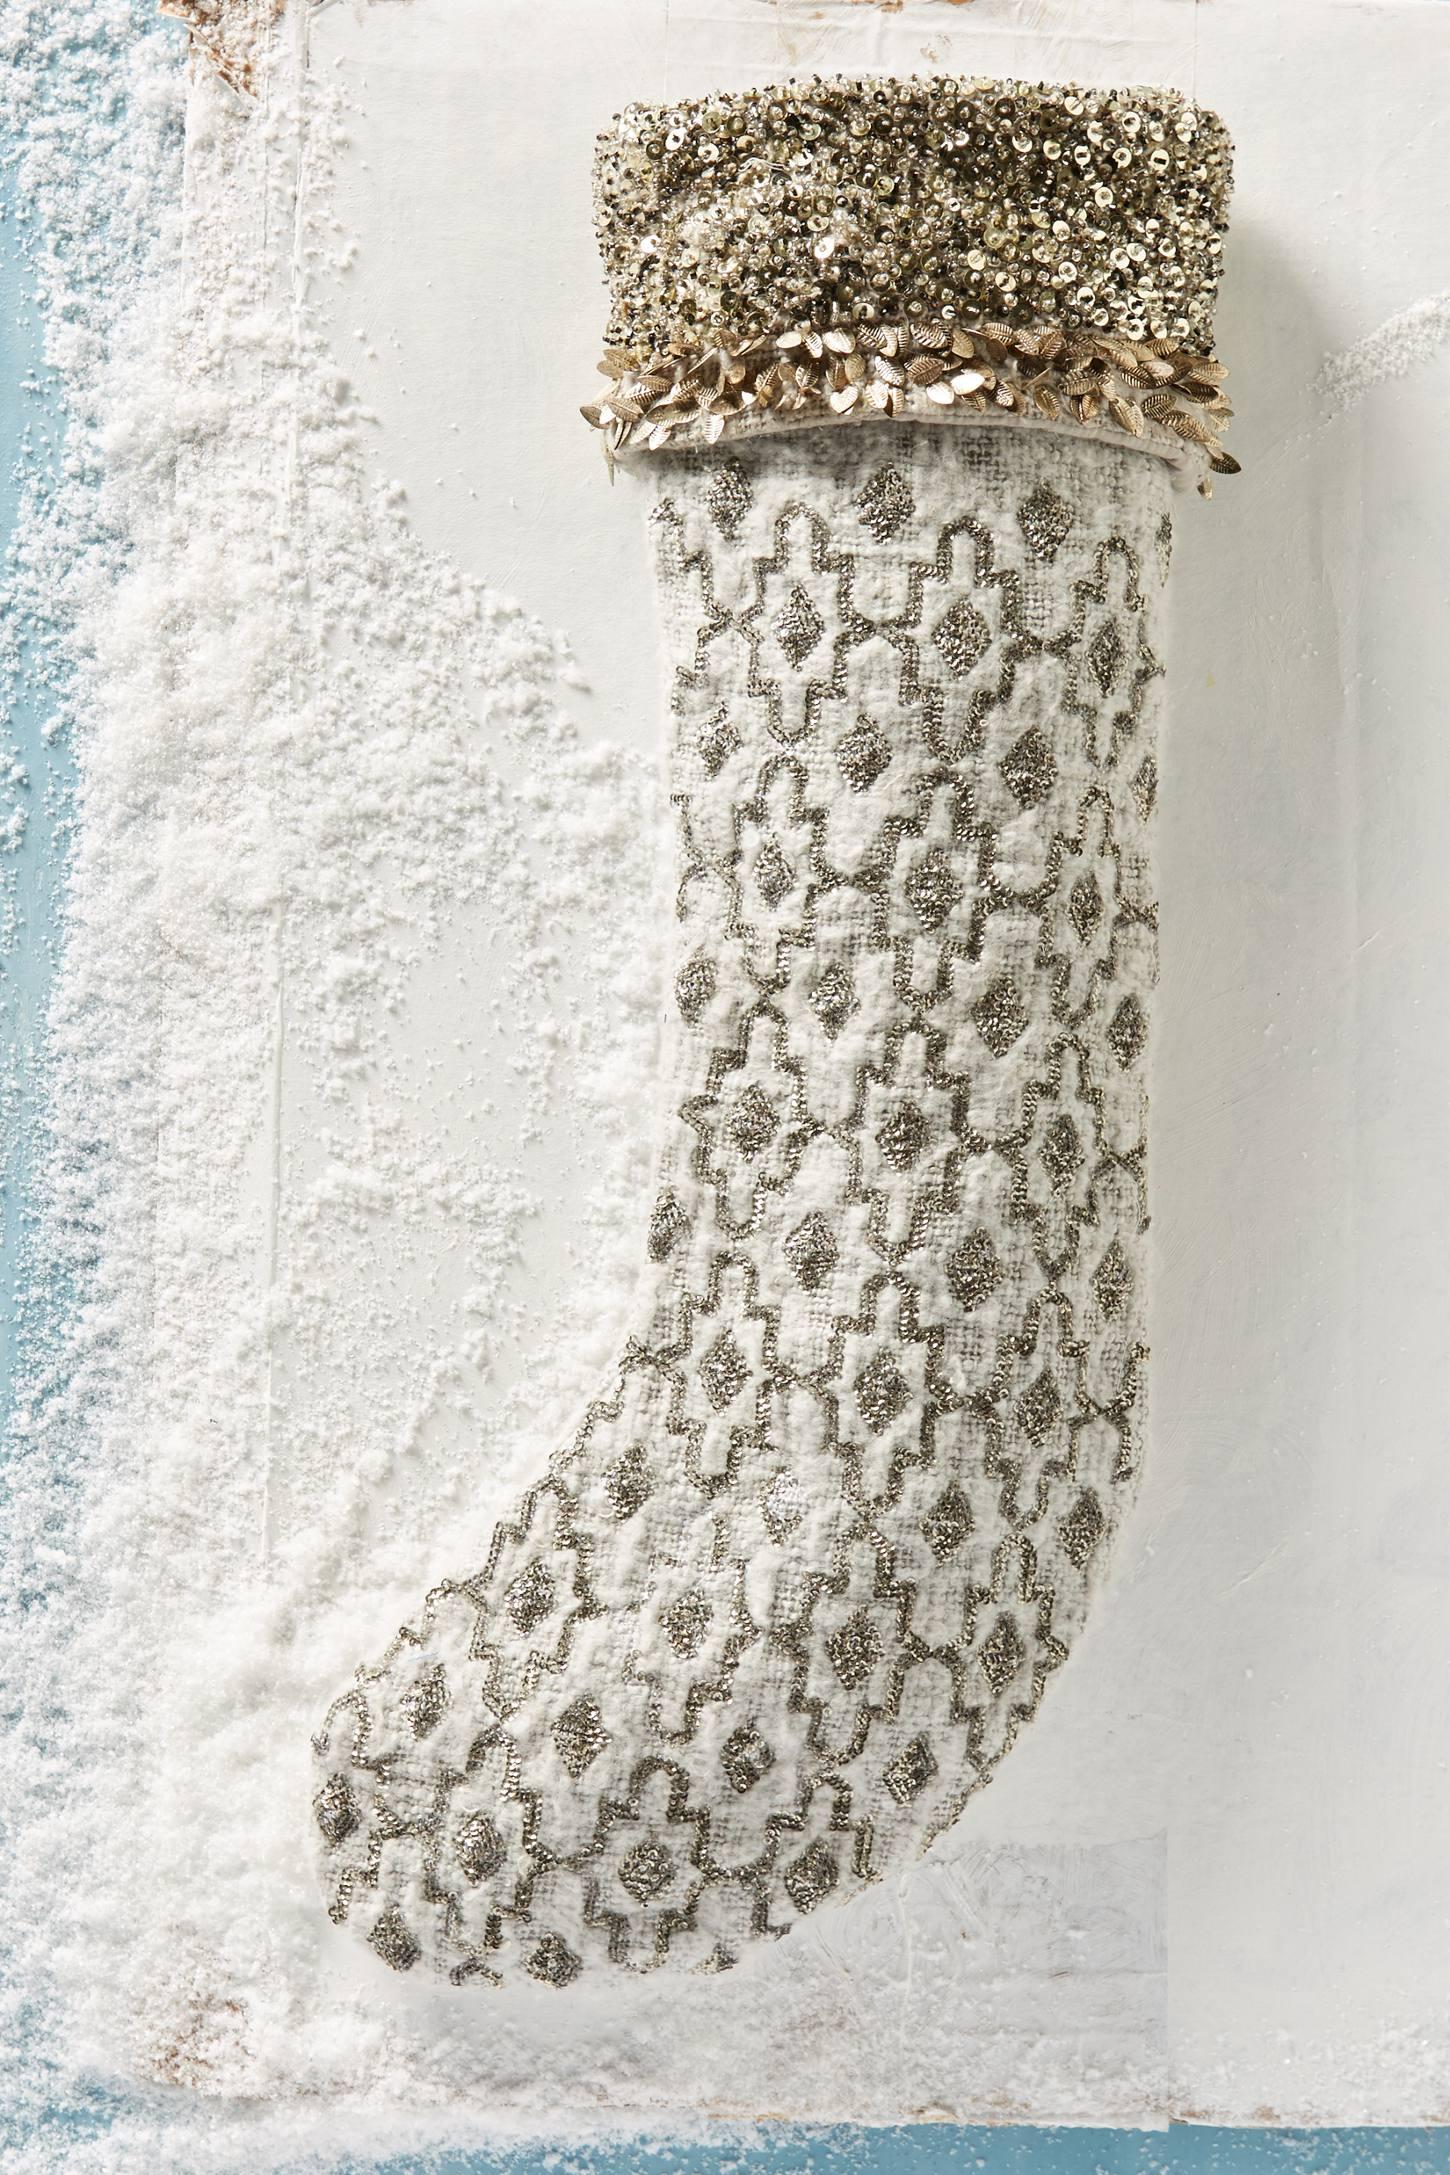 Moritz Sequined Stocking